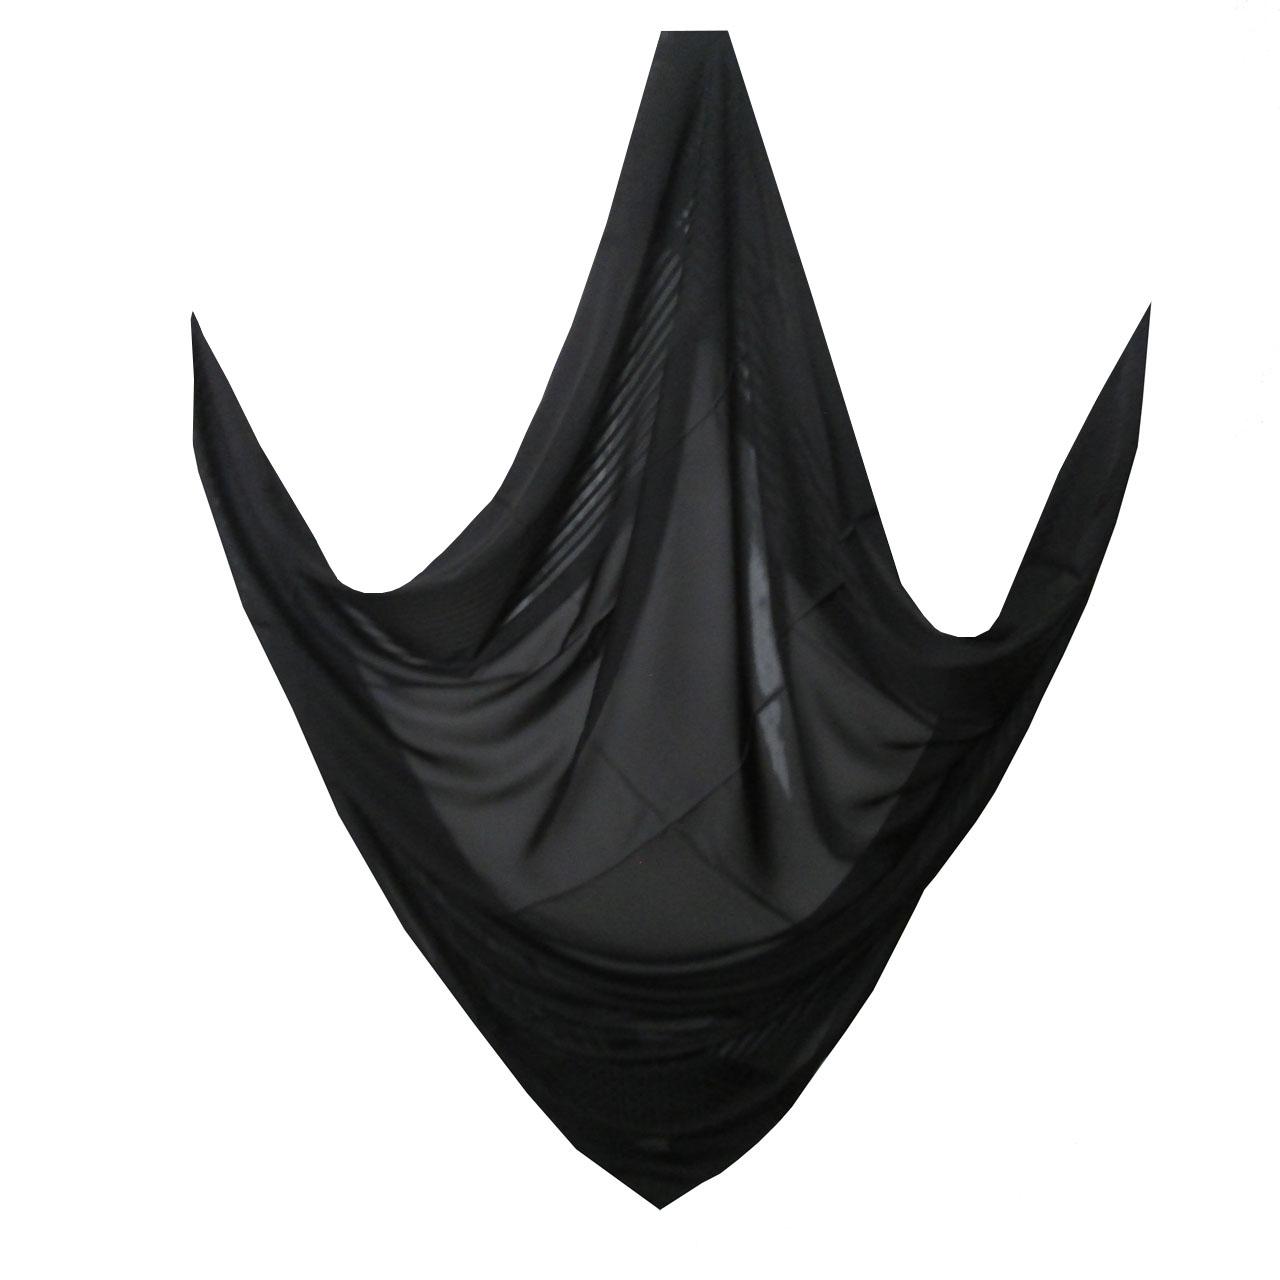 روسری توتو طرح حاشیهدار